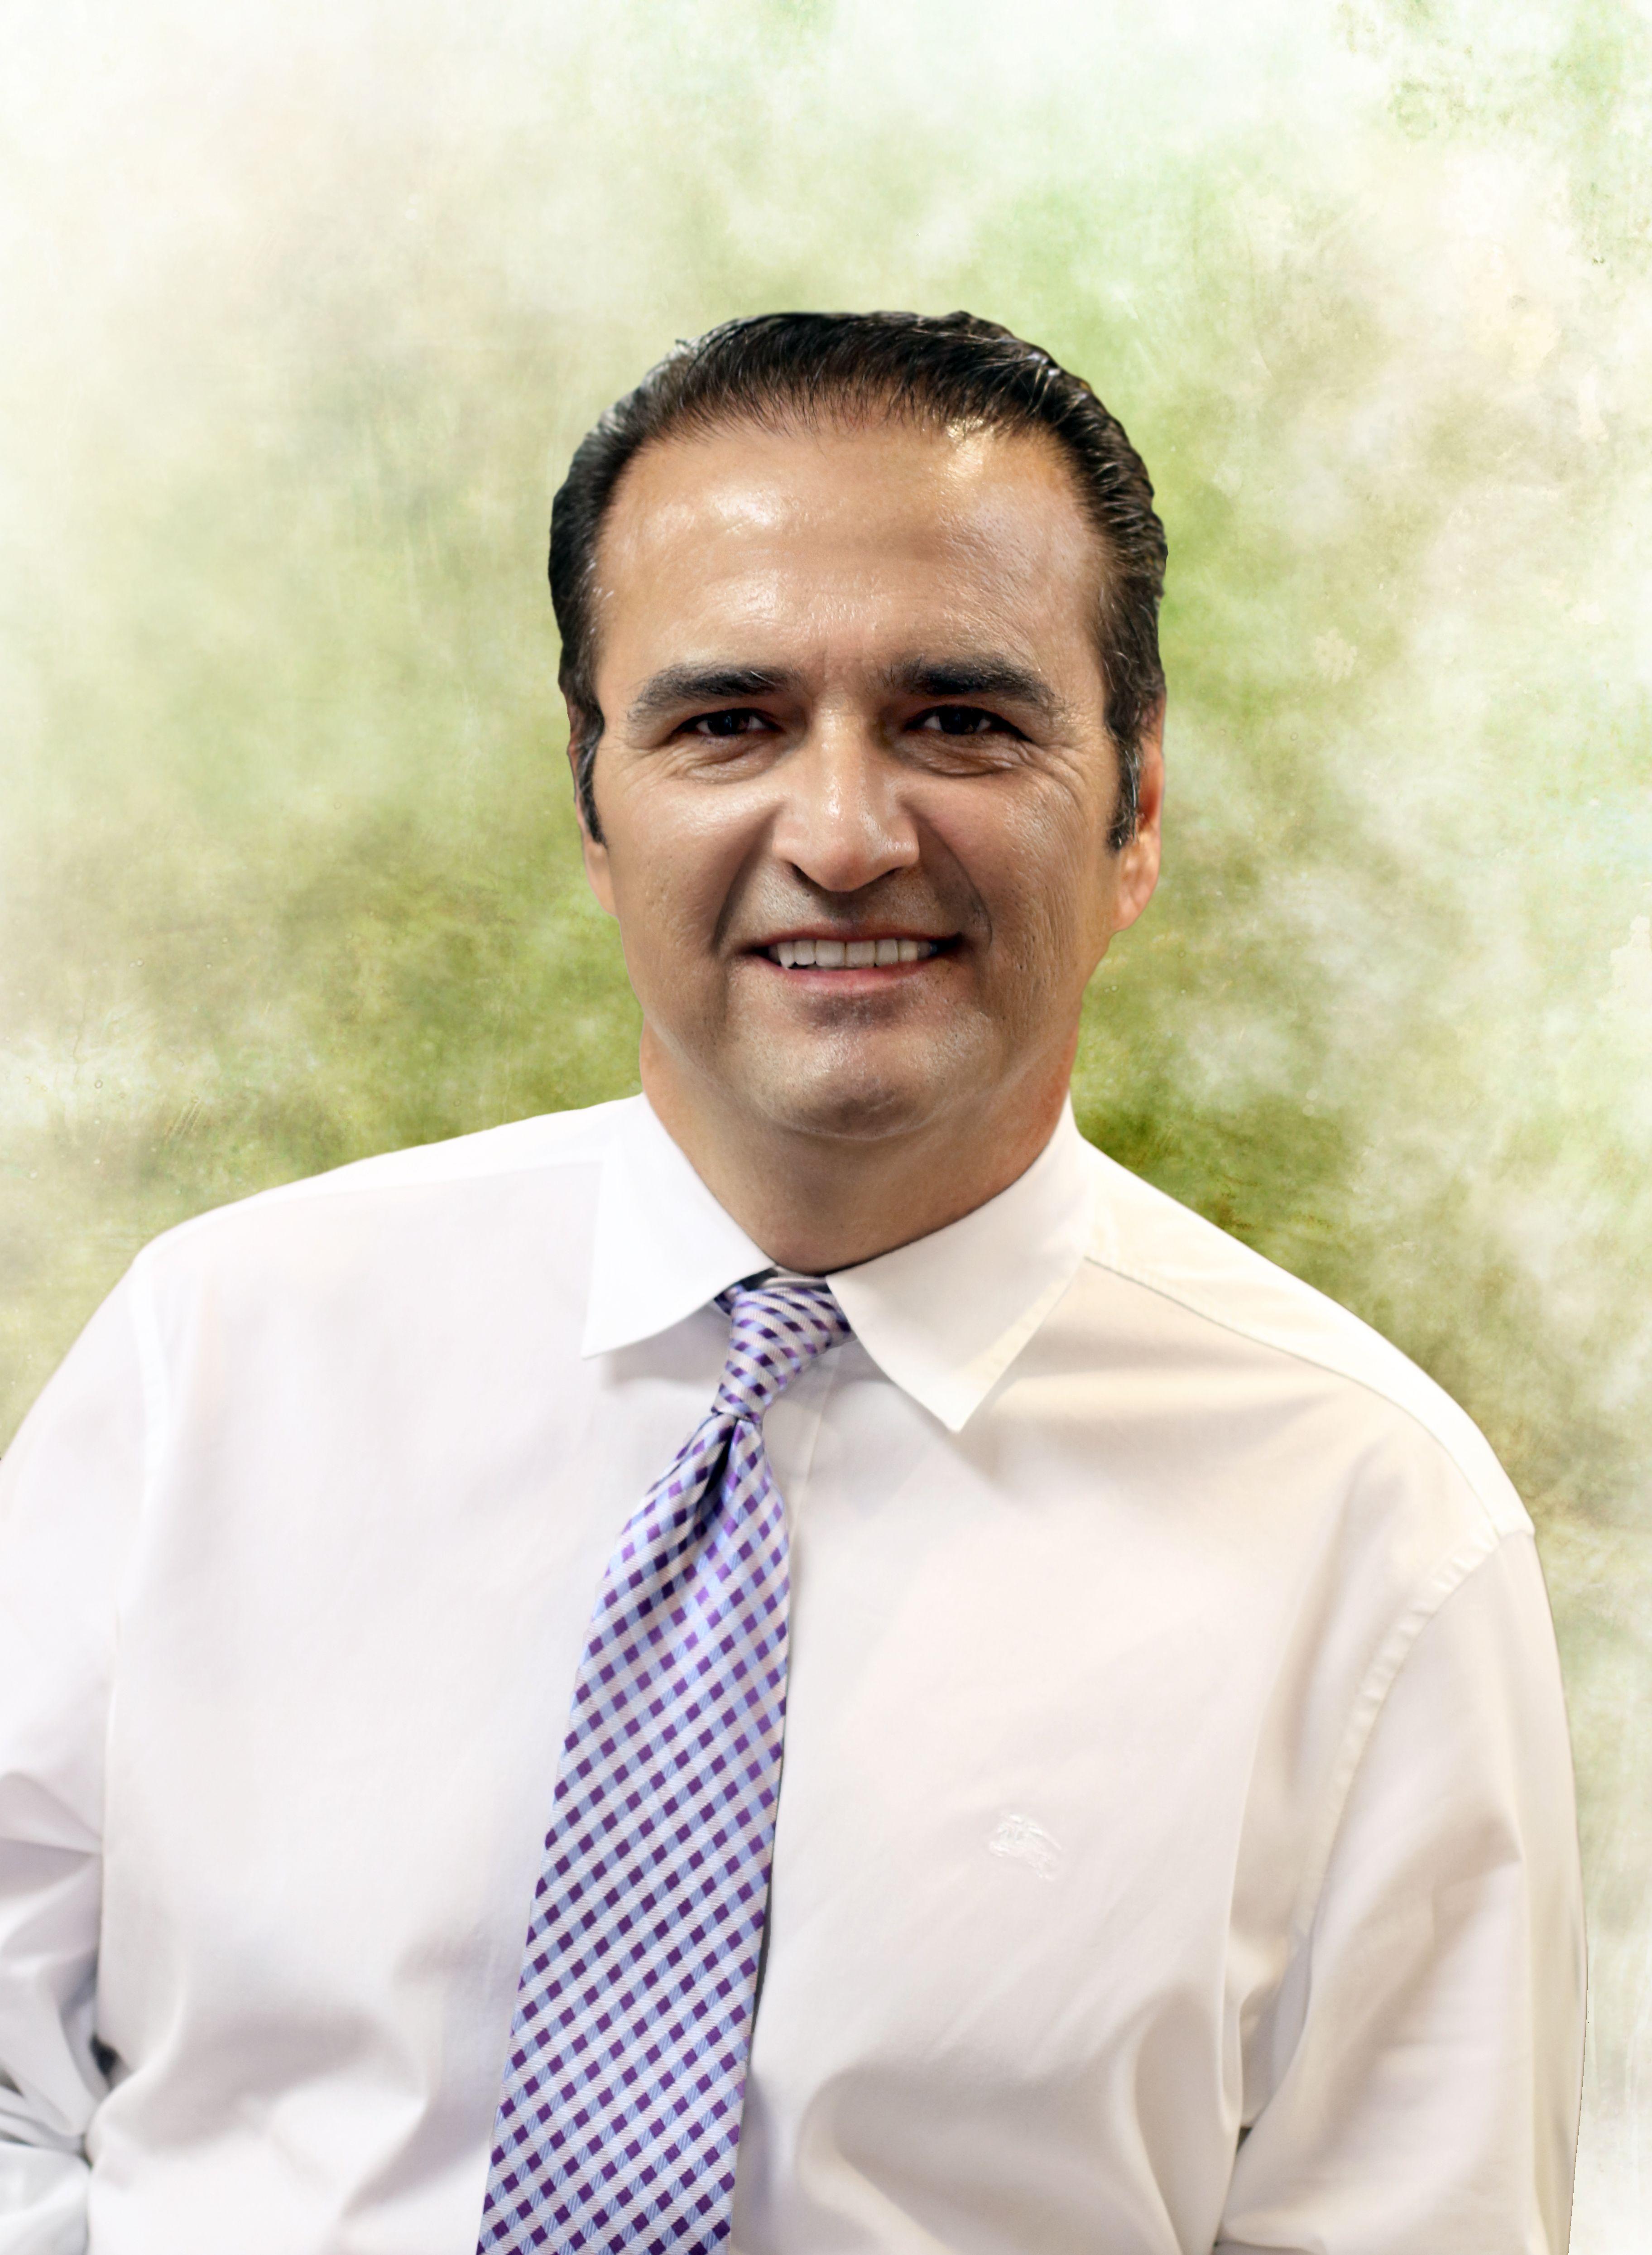 Meet The Doctor Dr Spiros Karas Cosmetic Dentist Dentist Dental Art